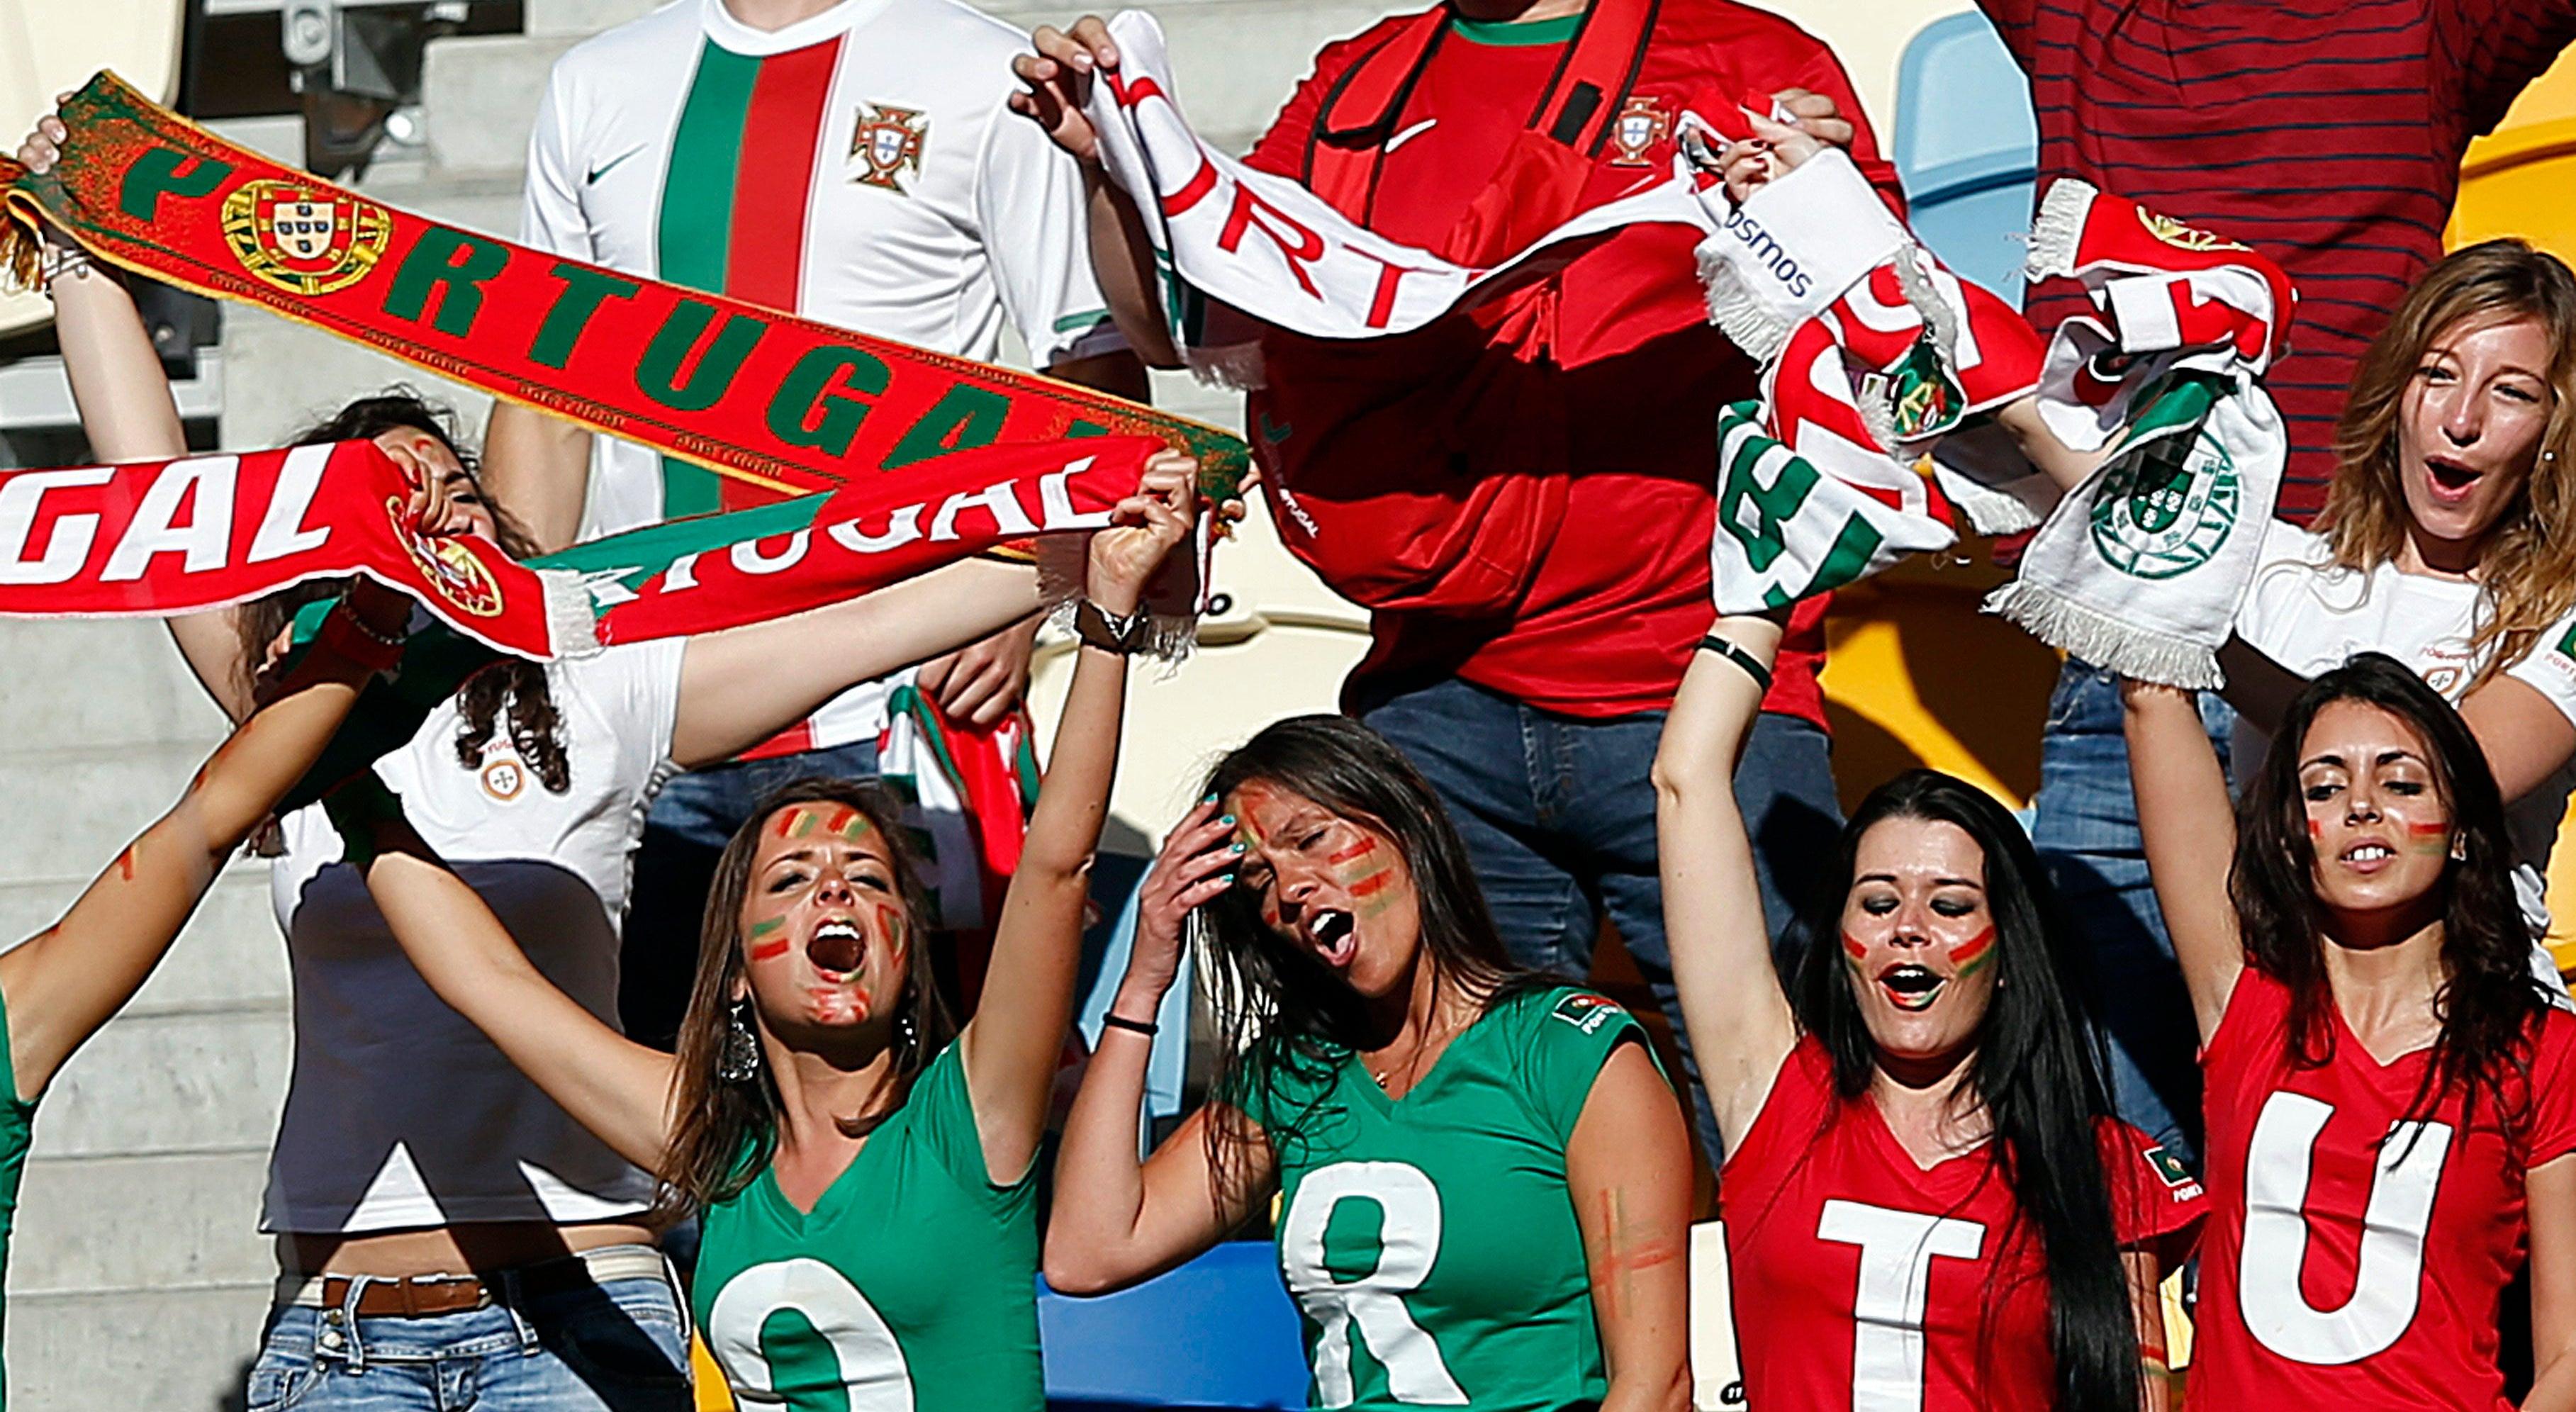 Dinamarca 2-3 Portugal, Grupo B do Euro 2012, 2.� jornada